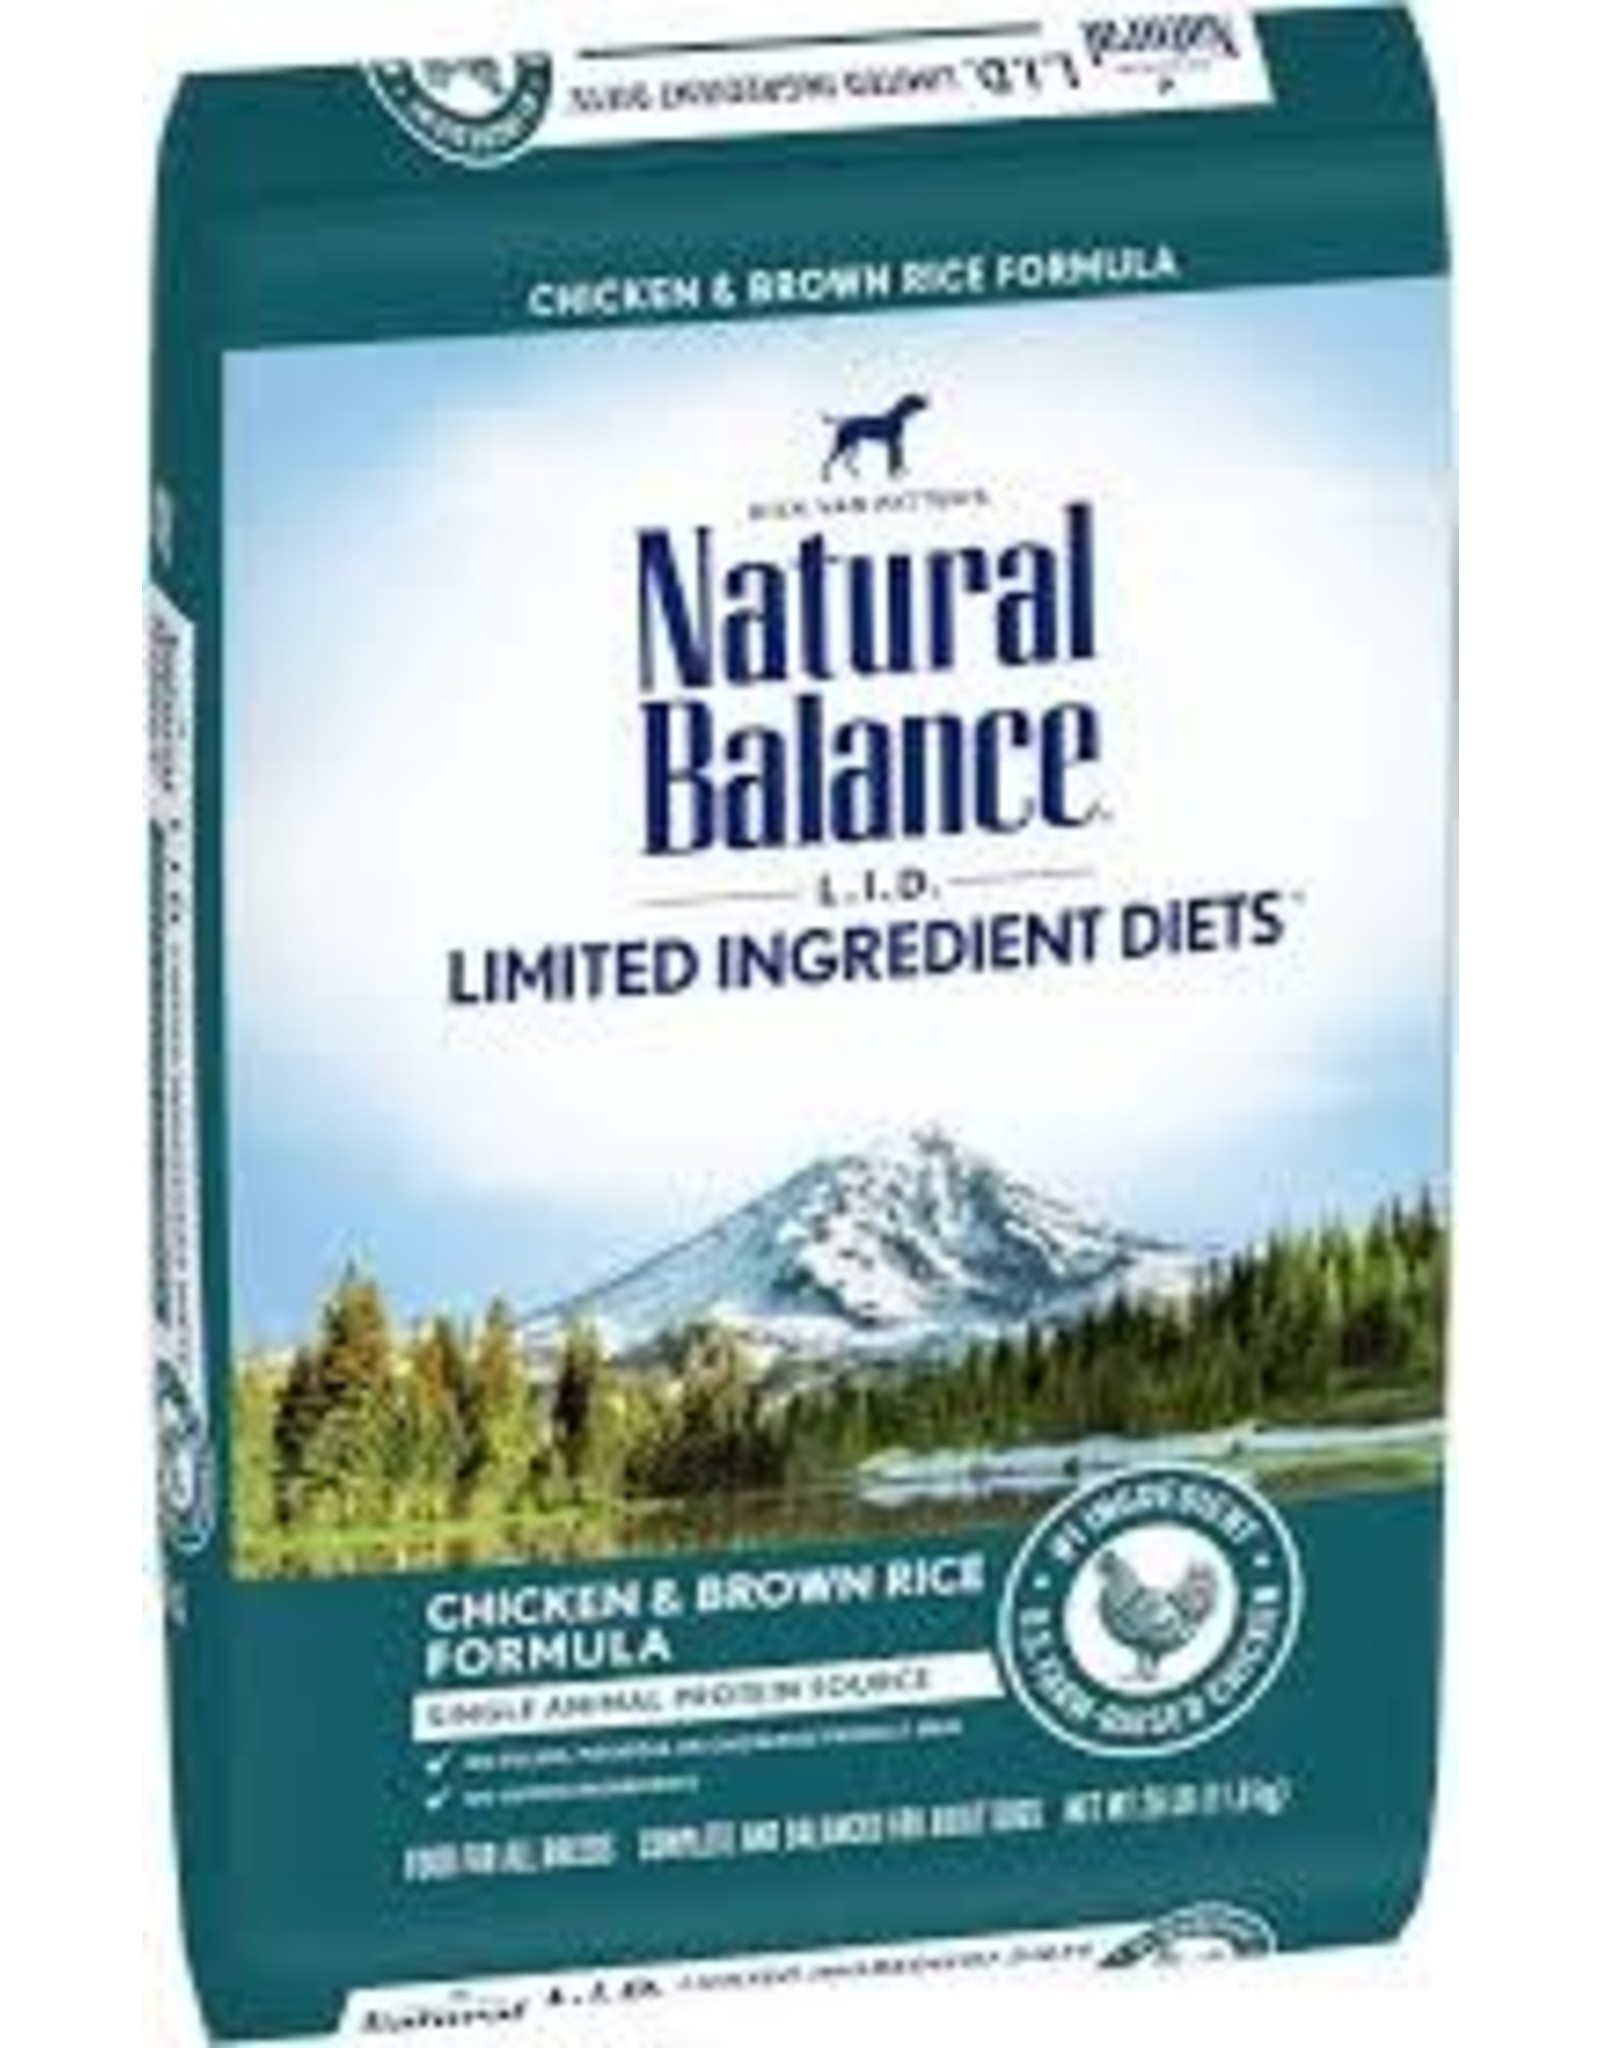 Natural Balance Natural Balance - LID Chicken & Brown Rice Dog